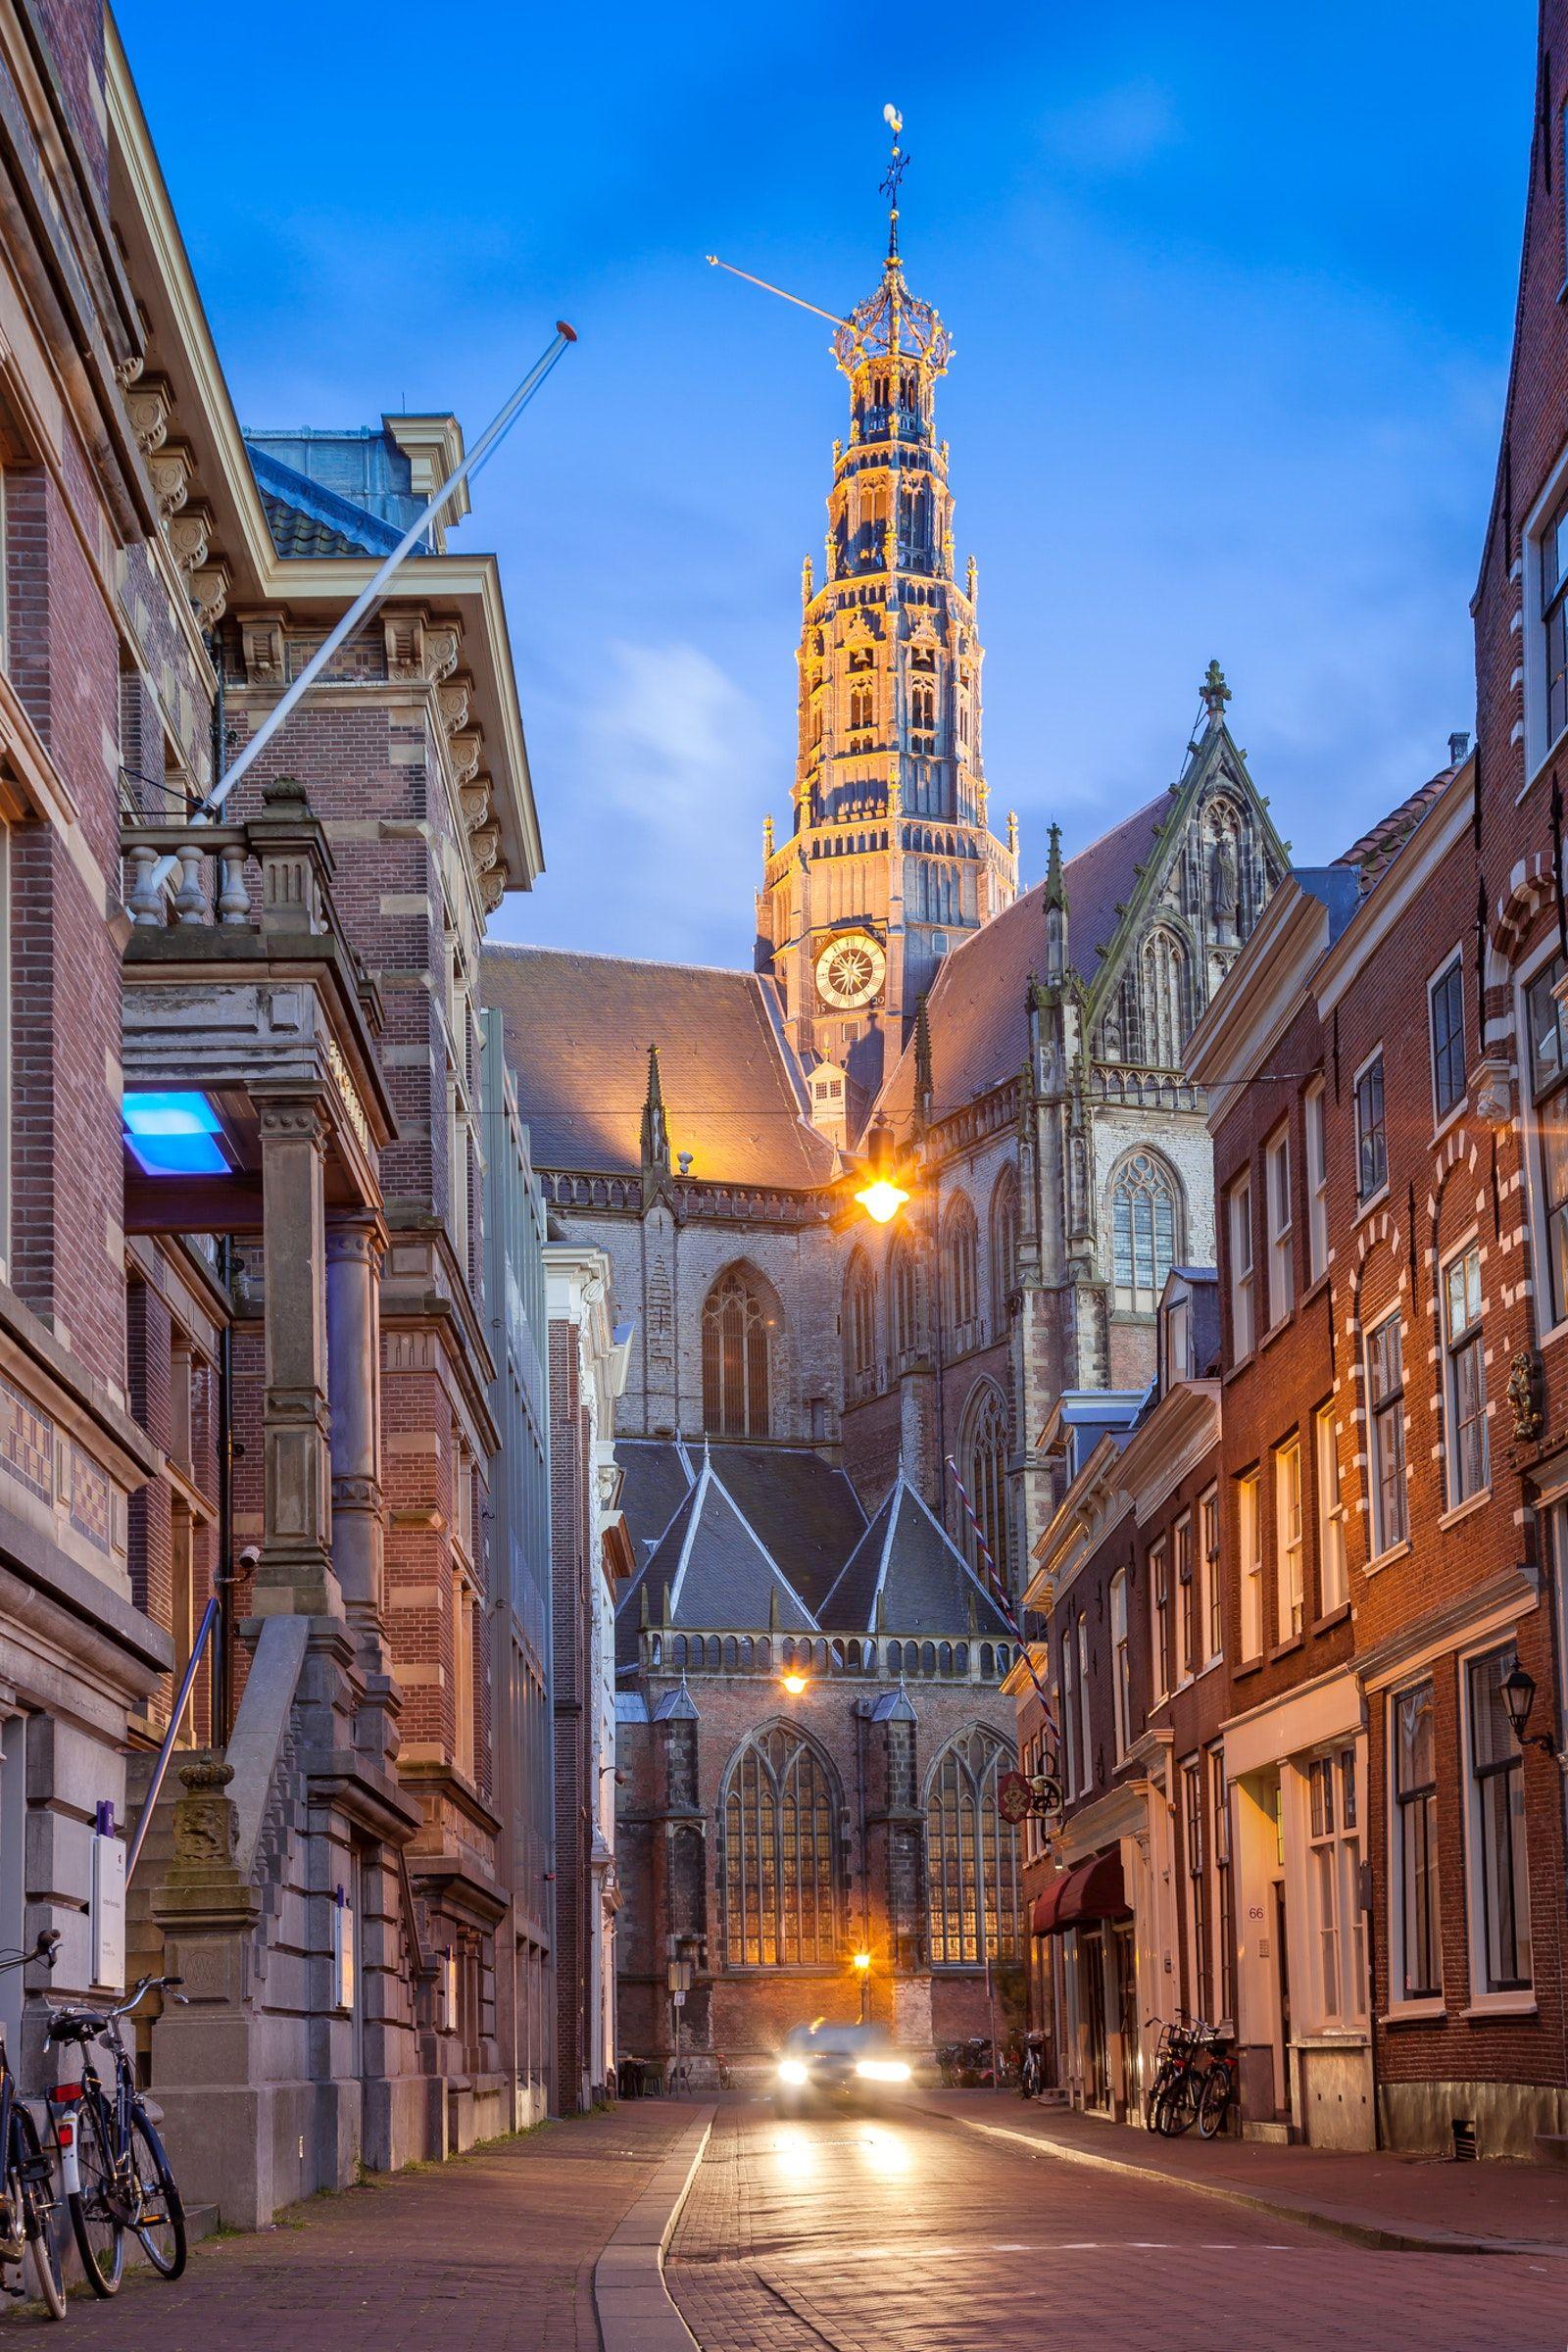 Haarlem The City of Flowers Haarlem, Ferry building san